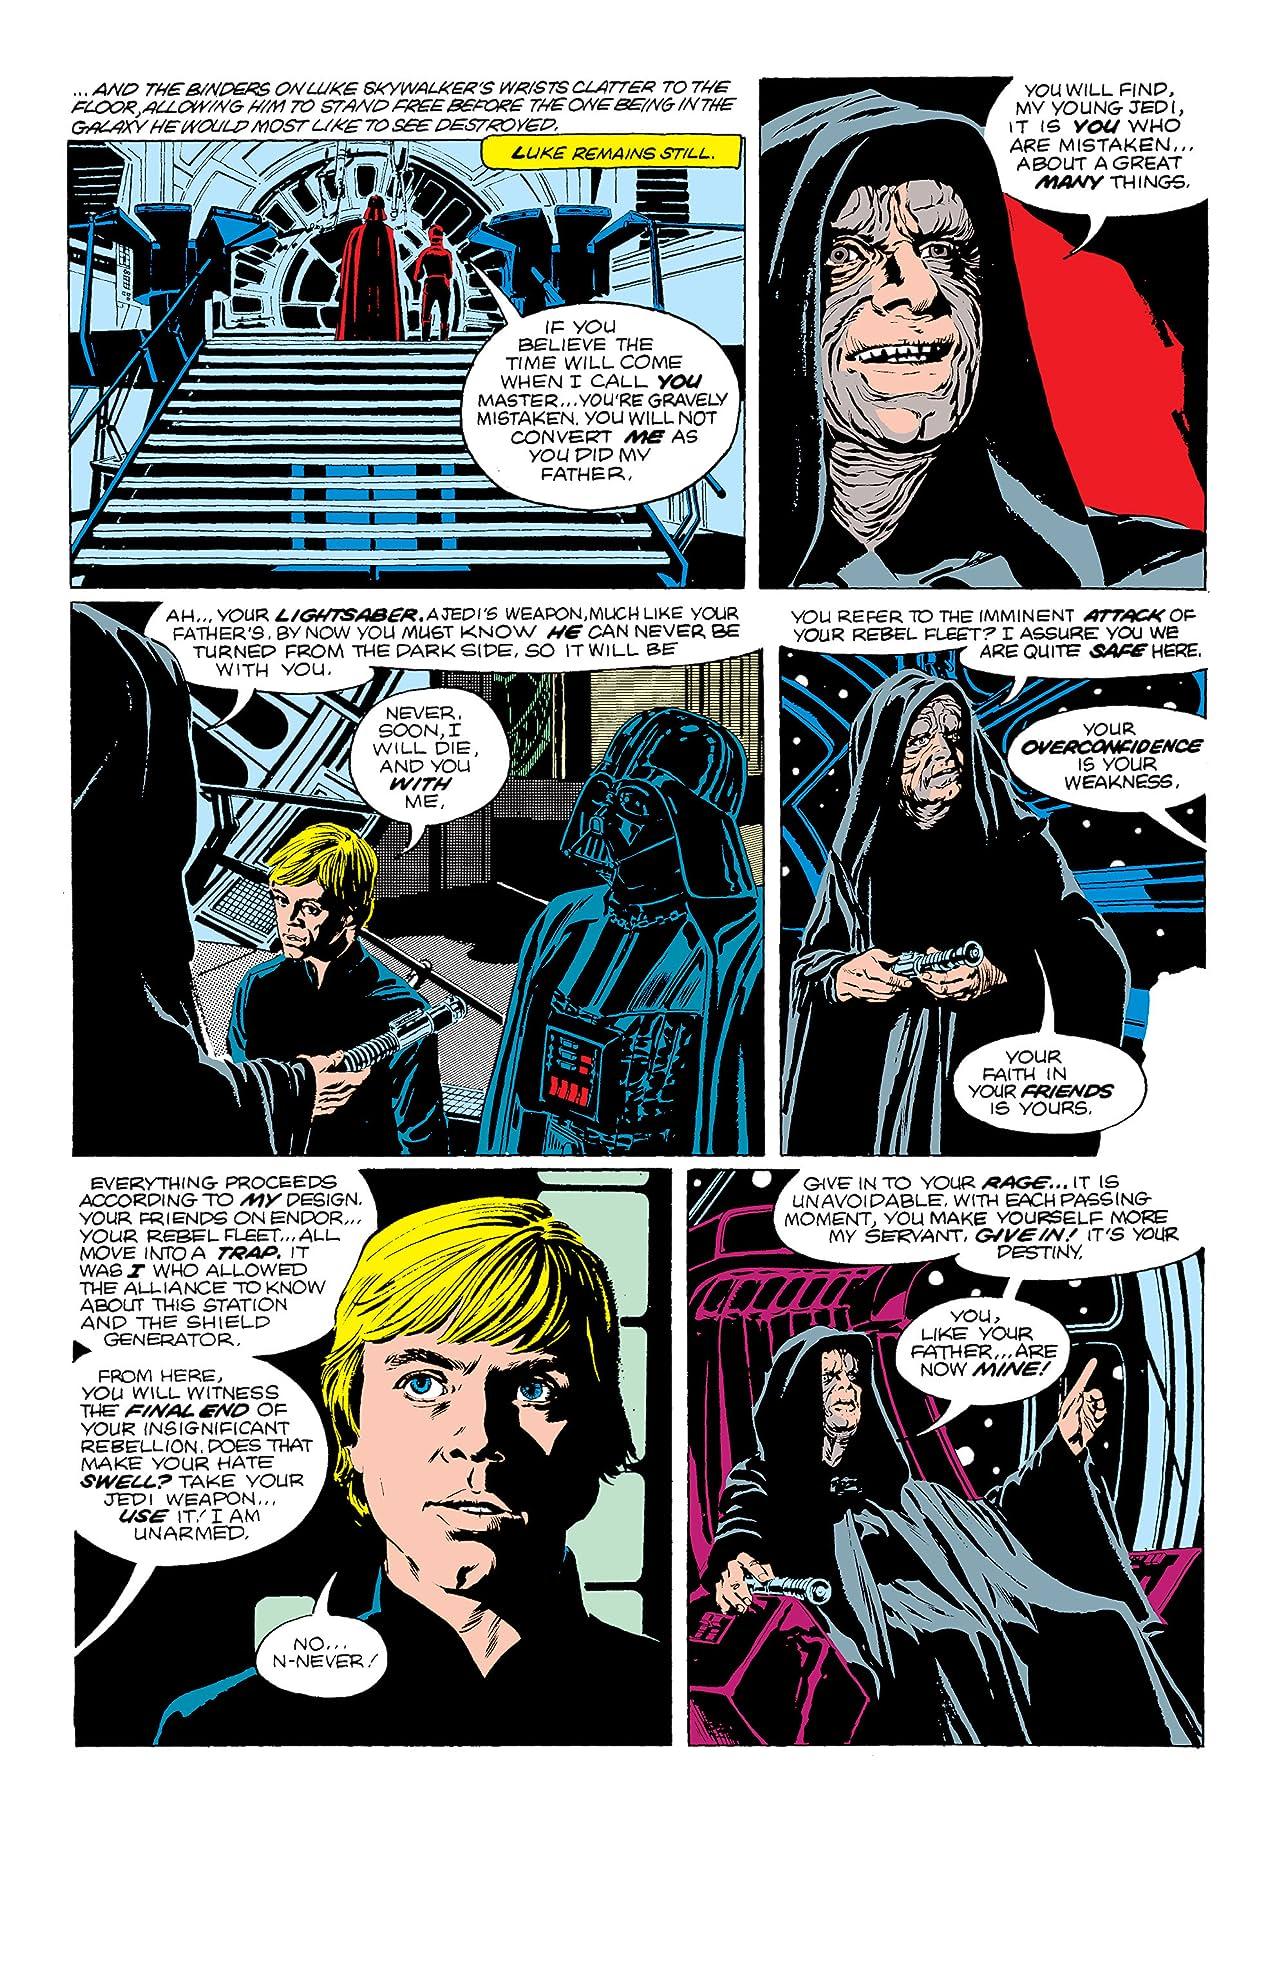 Star Wars: Return of the Jedi (1983-1984) #4 (of 4)